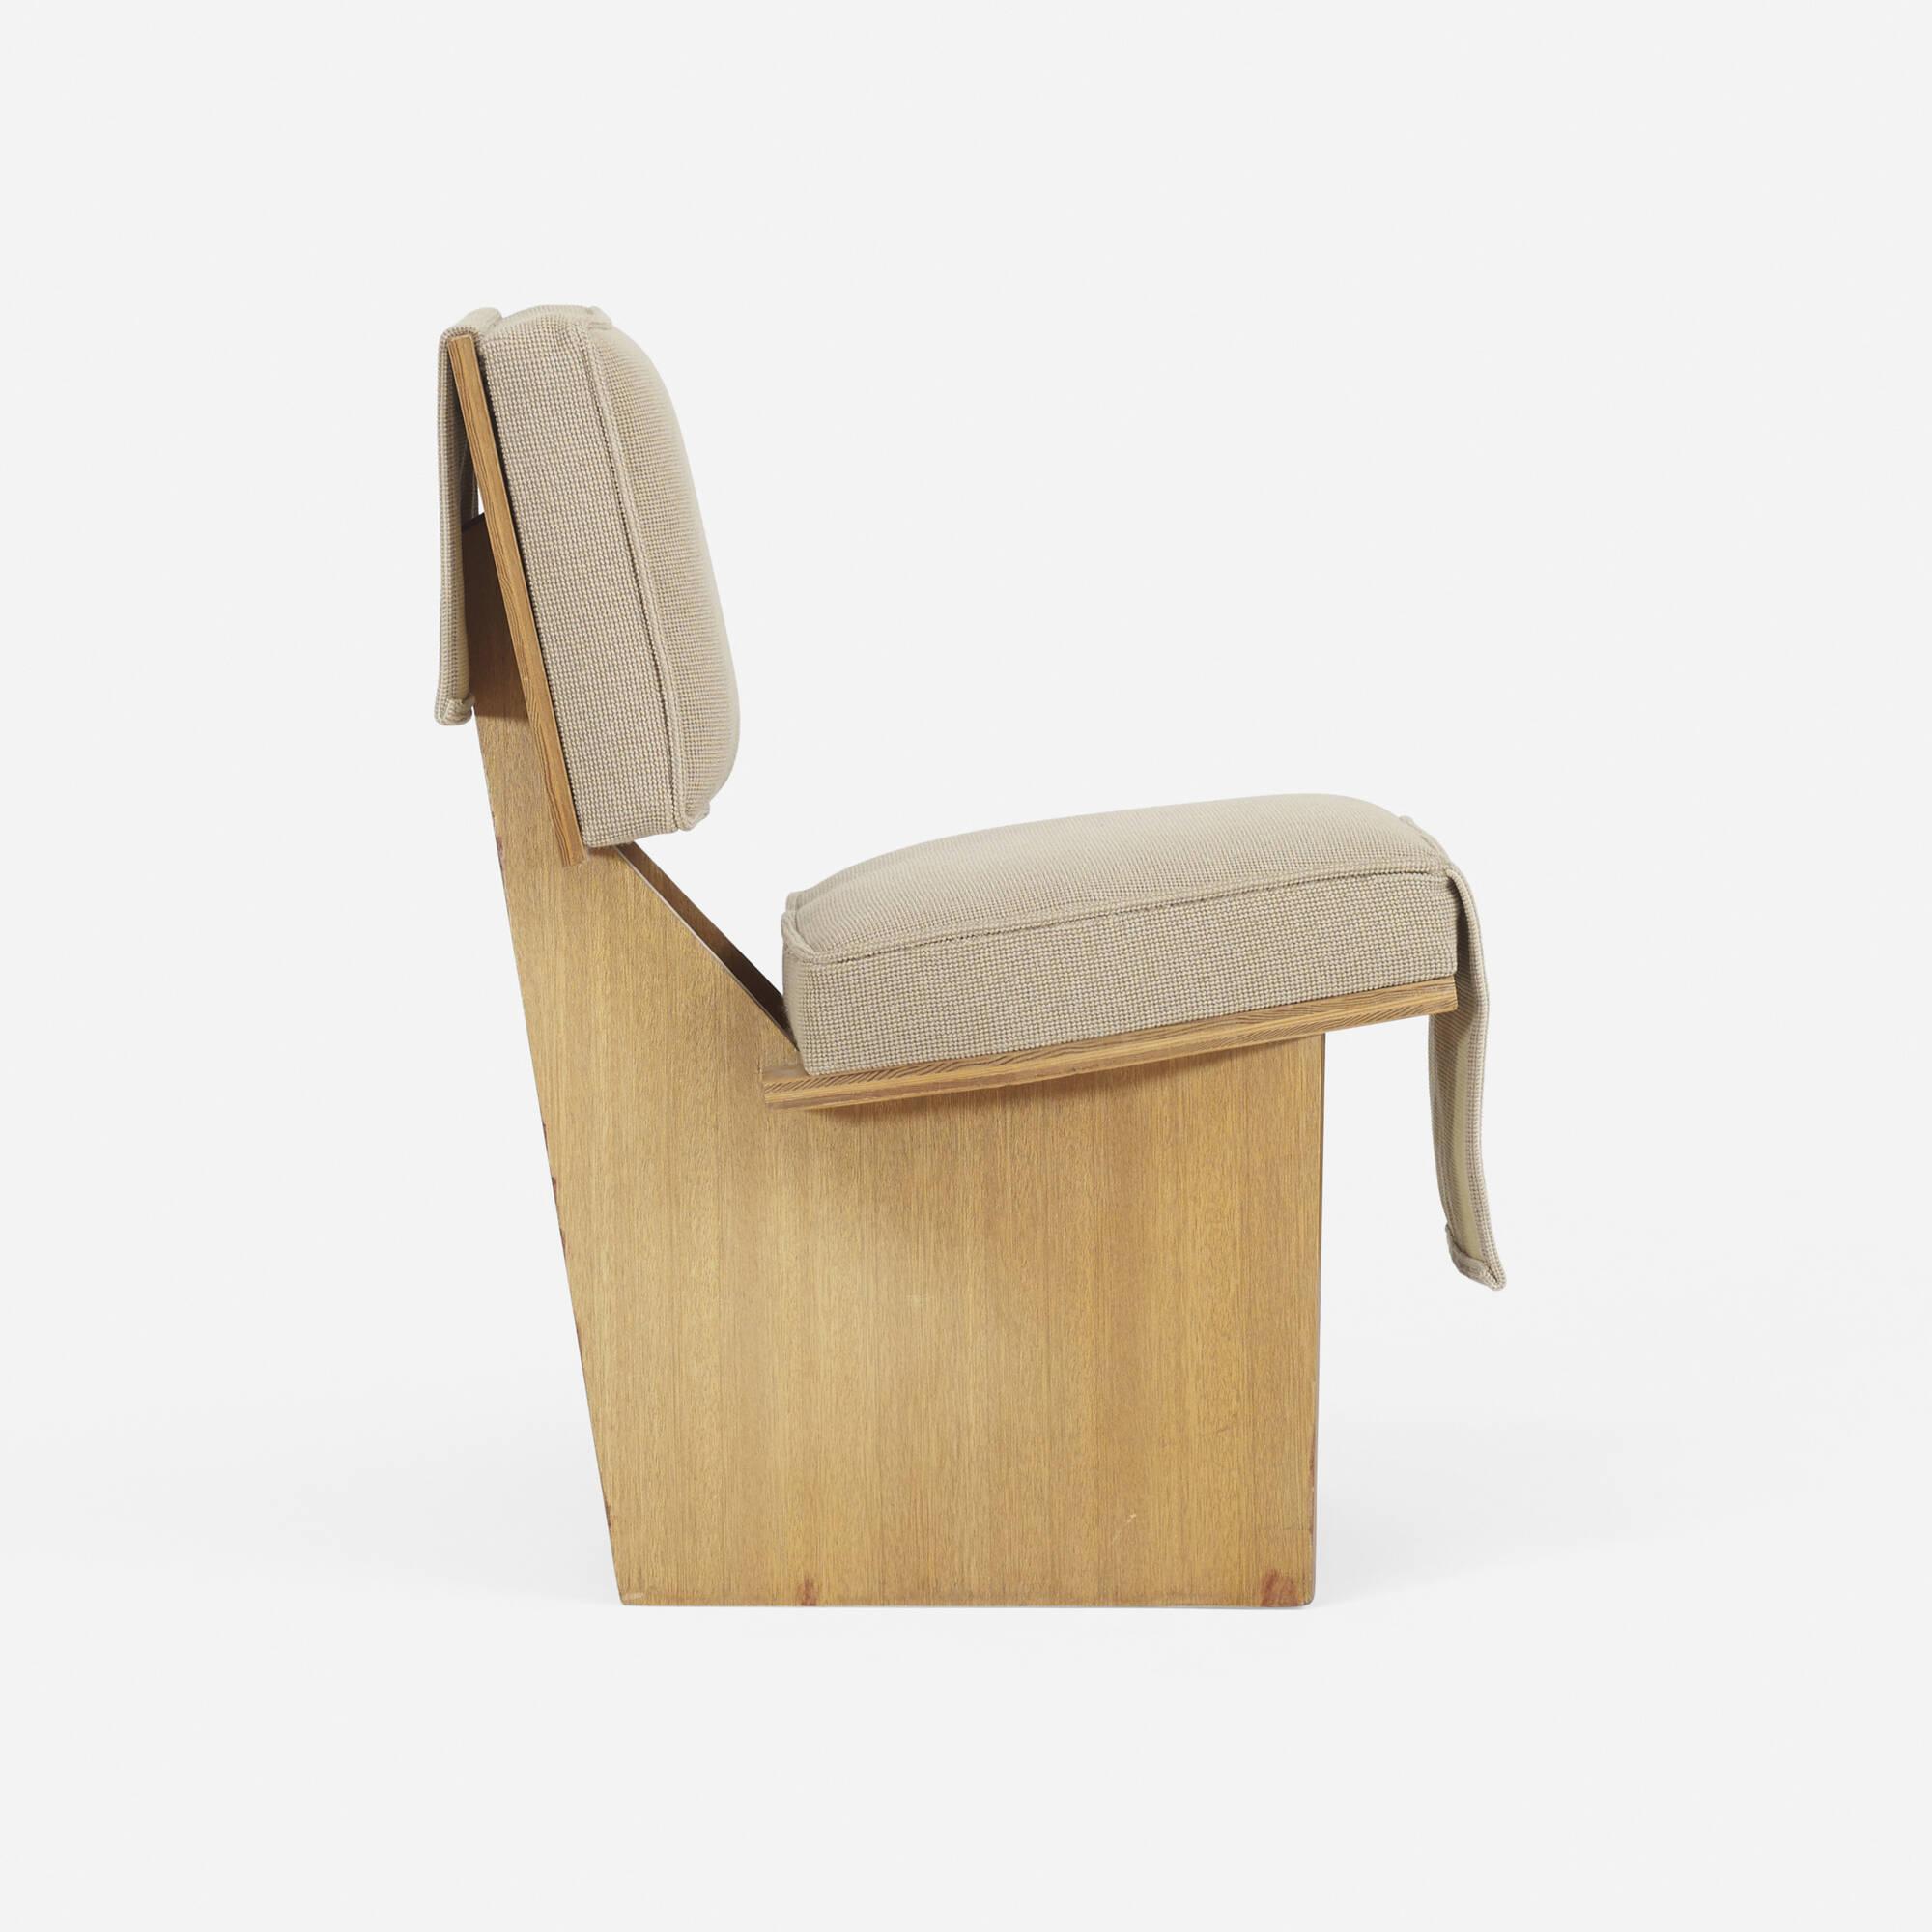 162 frank lloyd wright usonian lounge chair for Chair design 2000